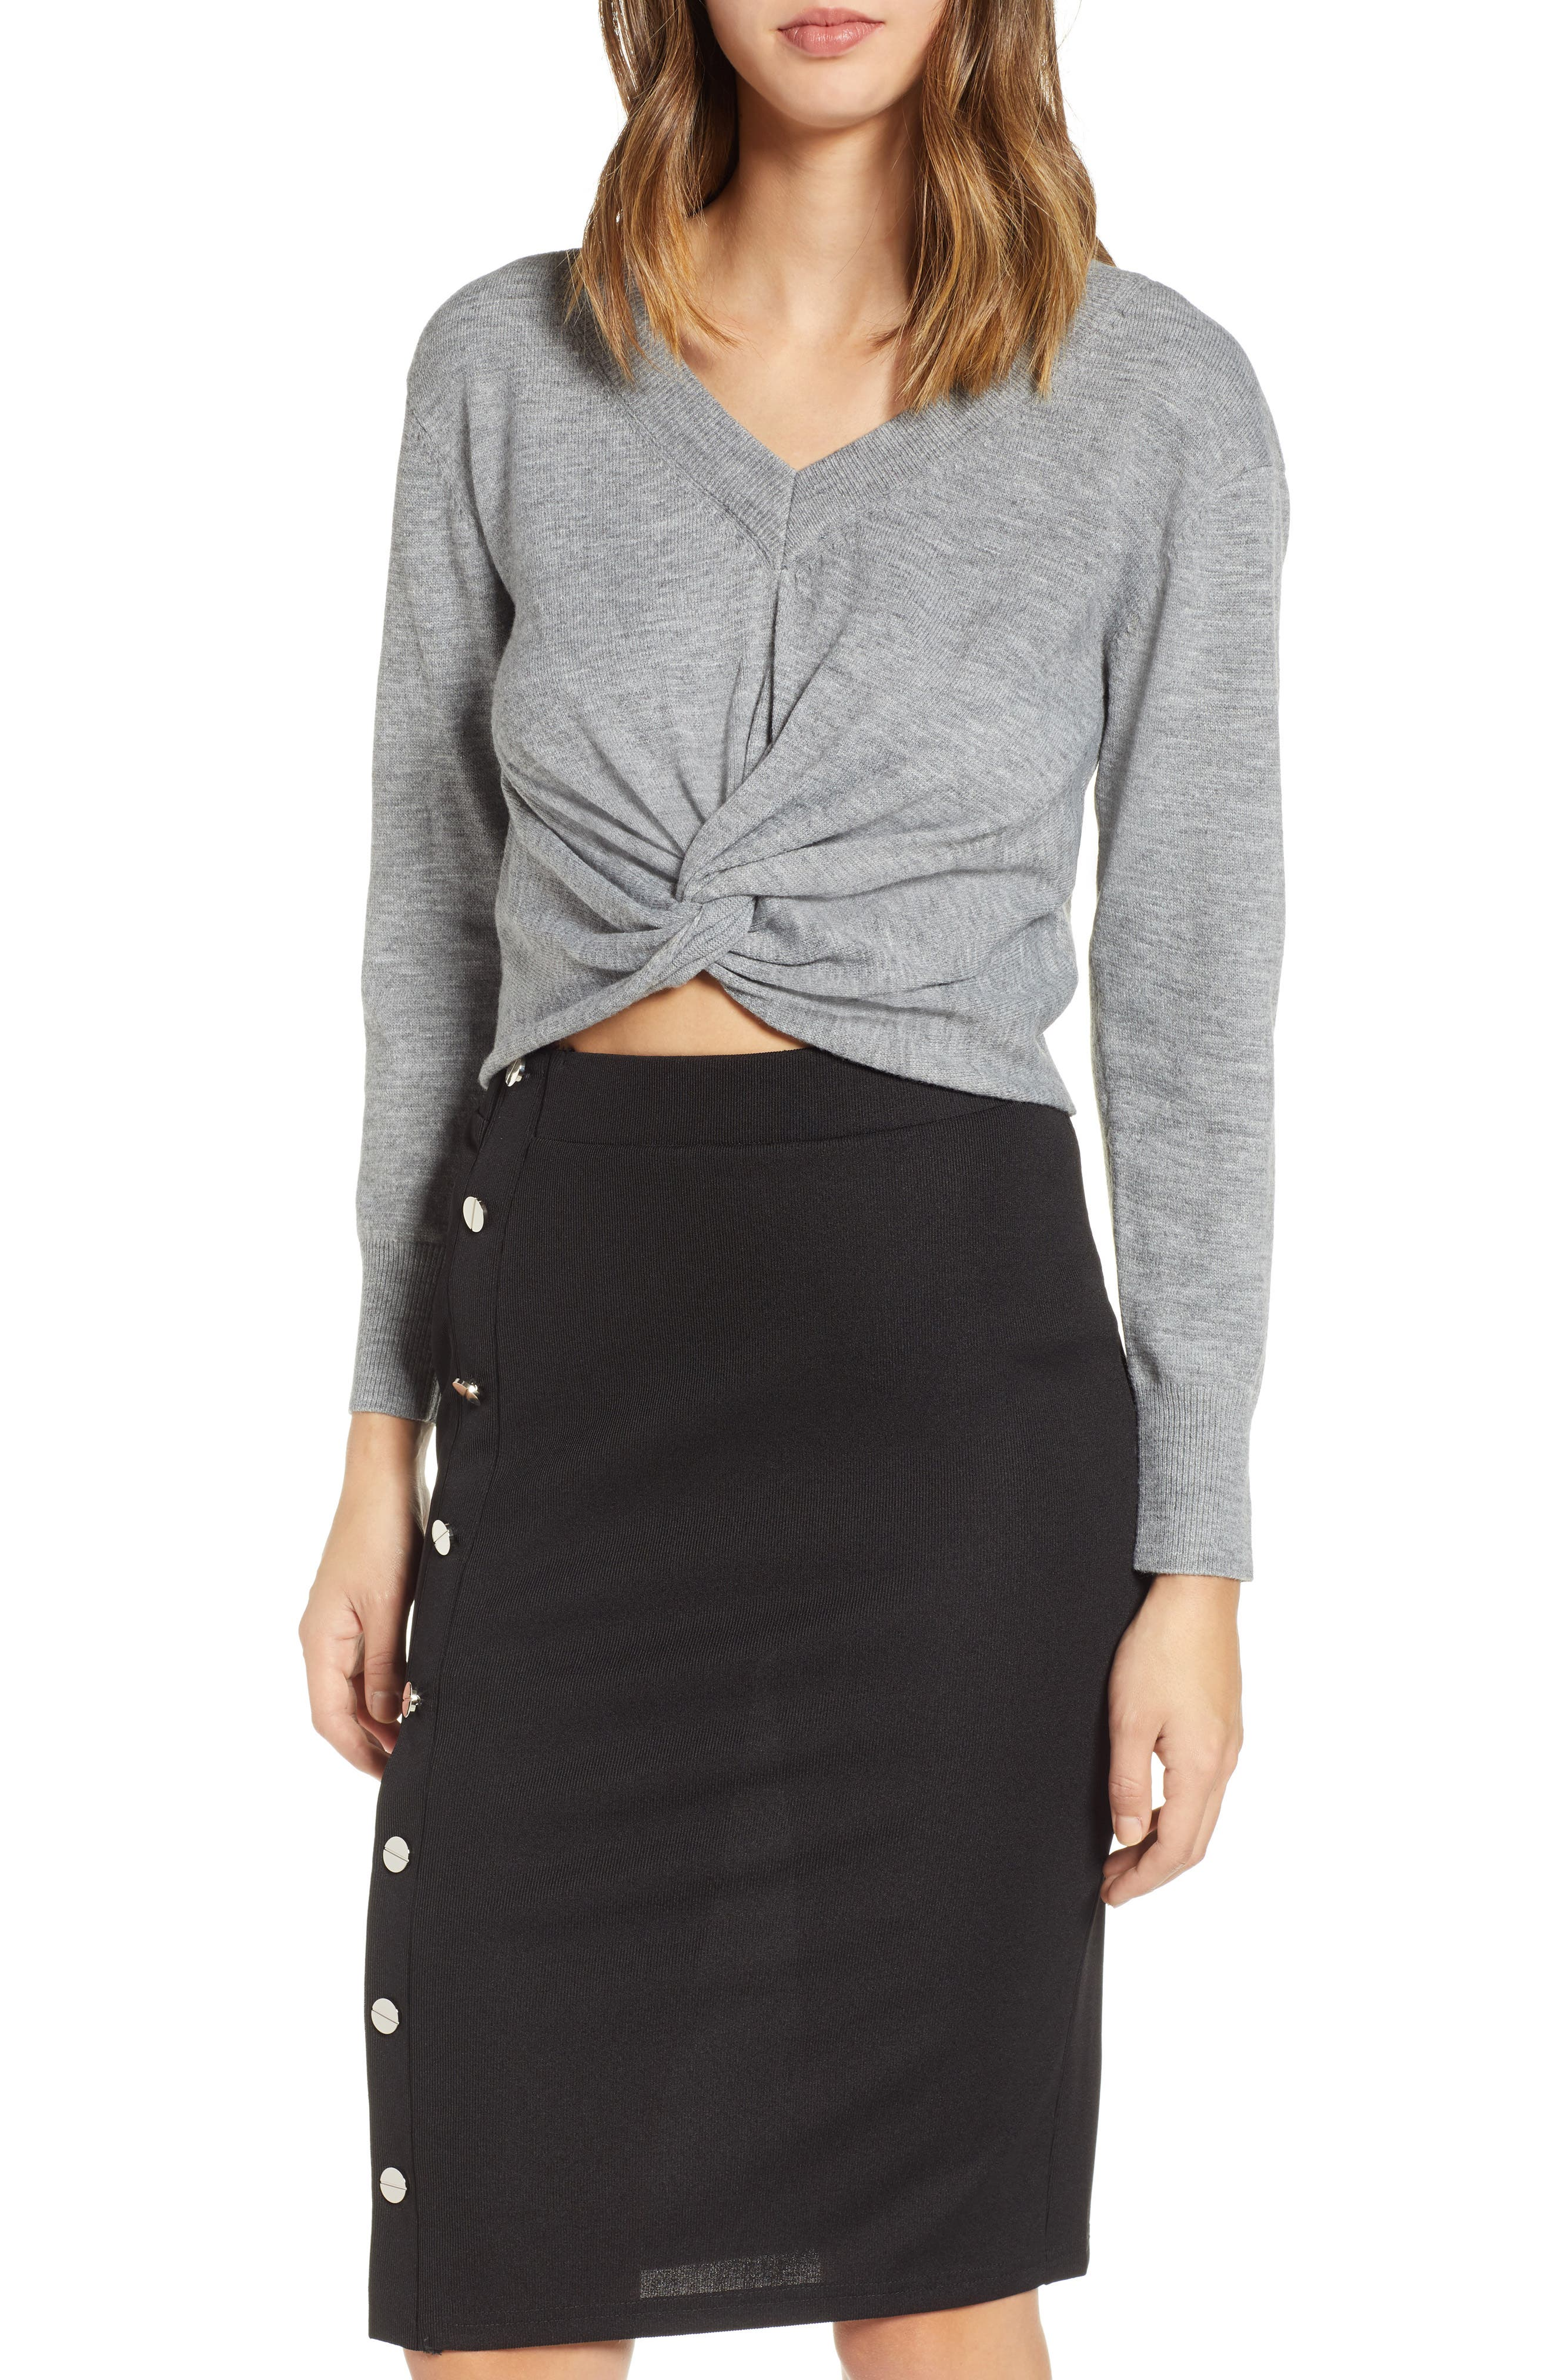 JOA Twist Front Knit Top in Grey